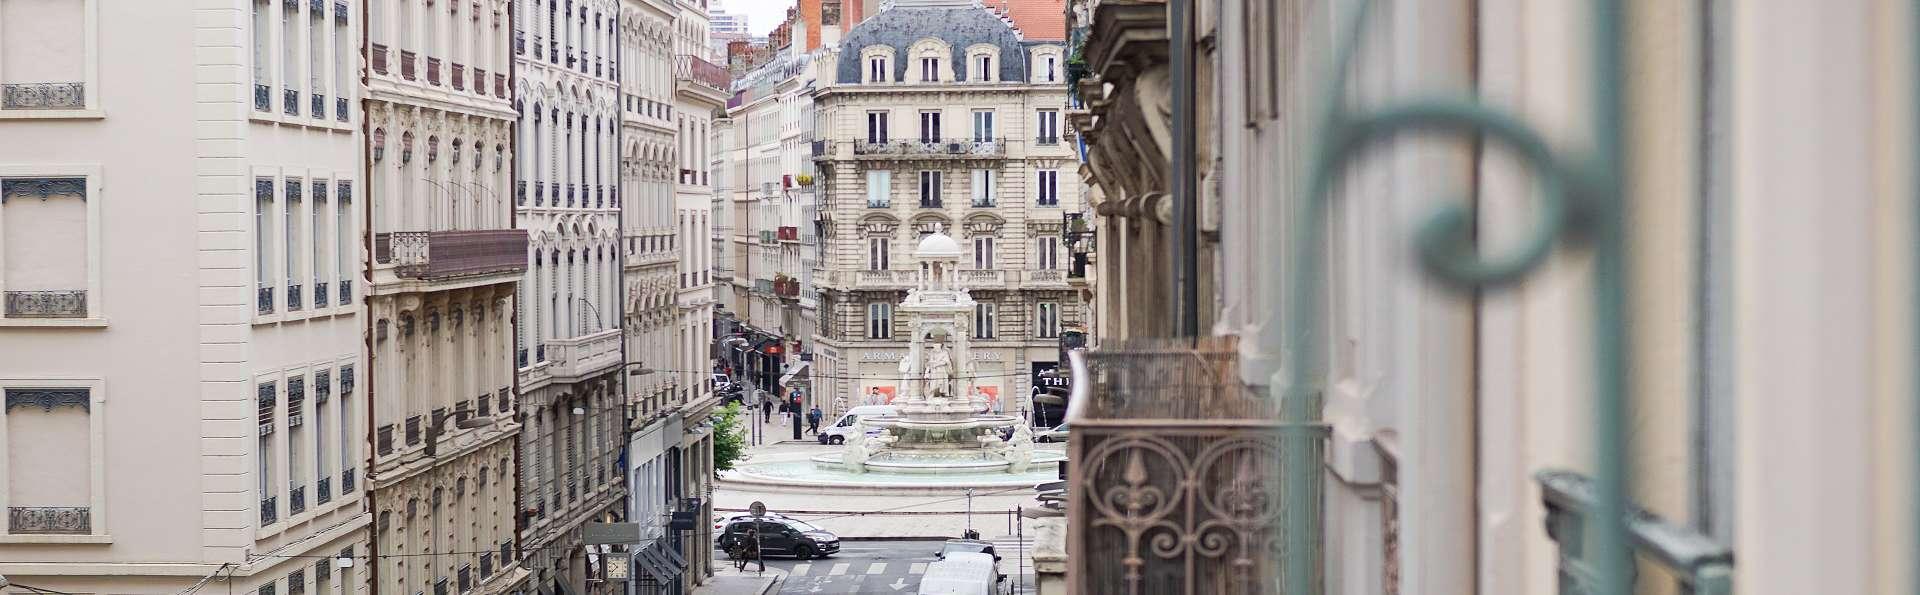 Hôtel Globe et Cecil - Jacobin.jpg